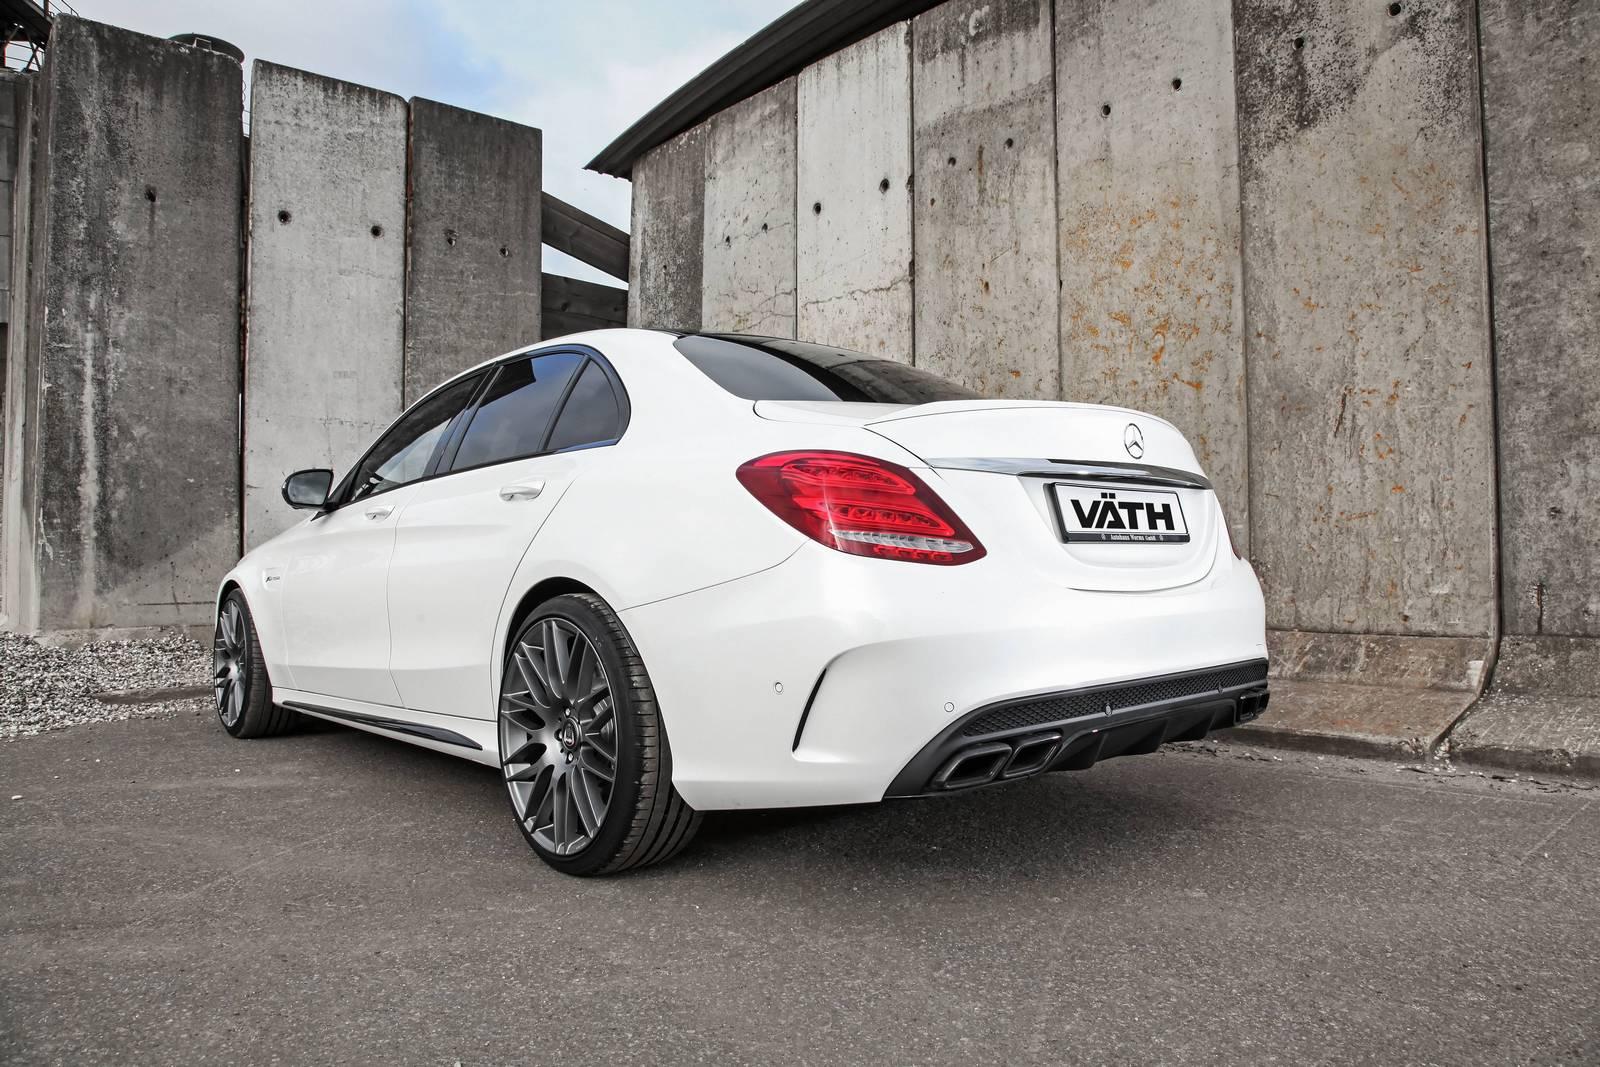 Official: 609hp Mercedes-AMG C63 by Vath - GTspirit